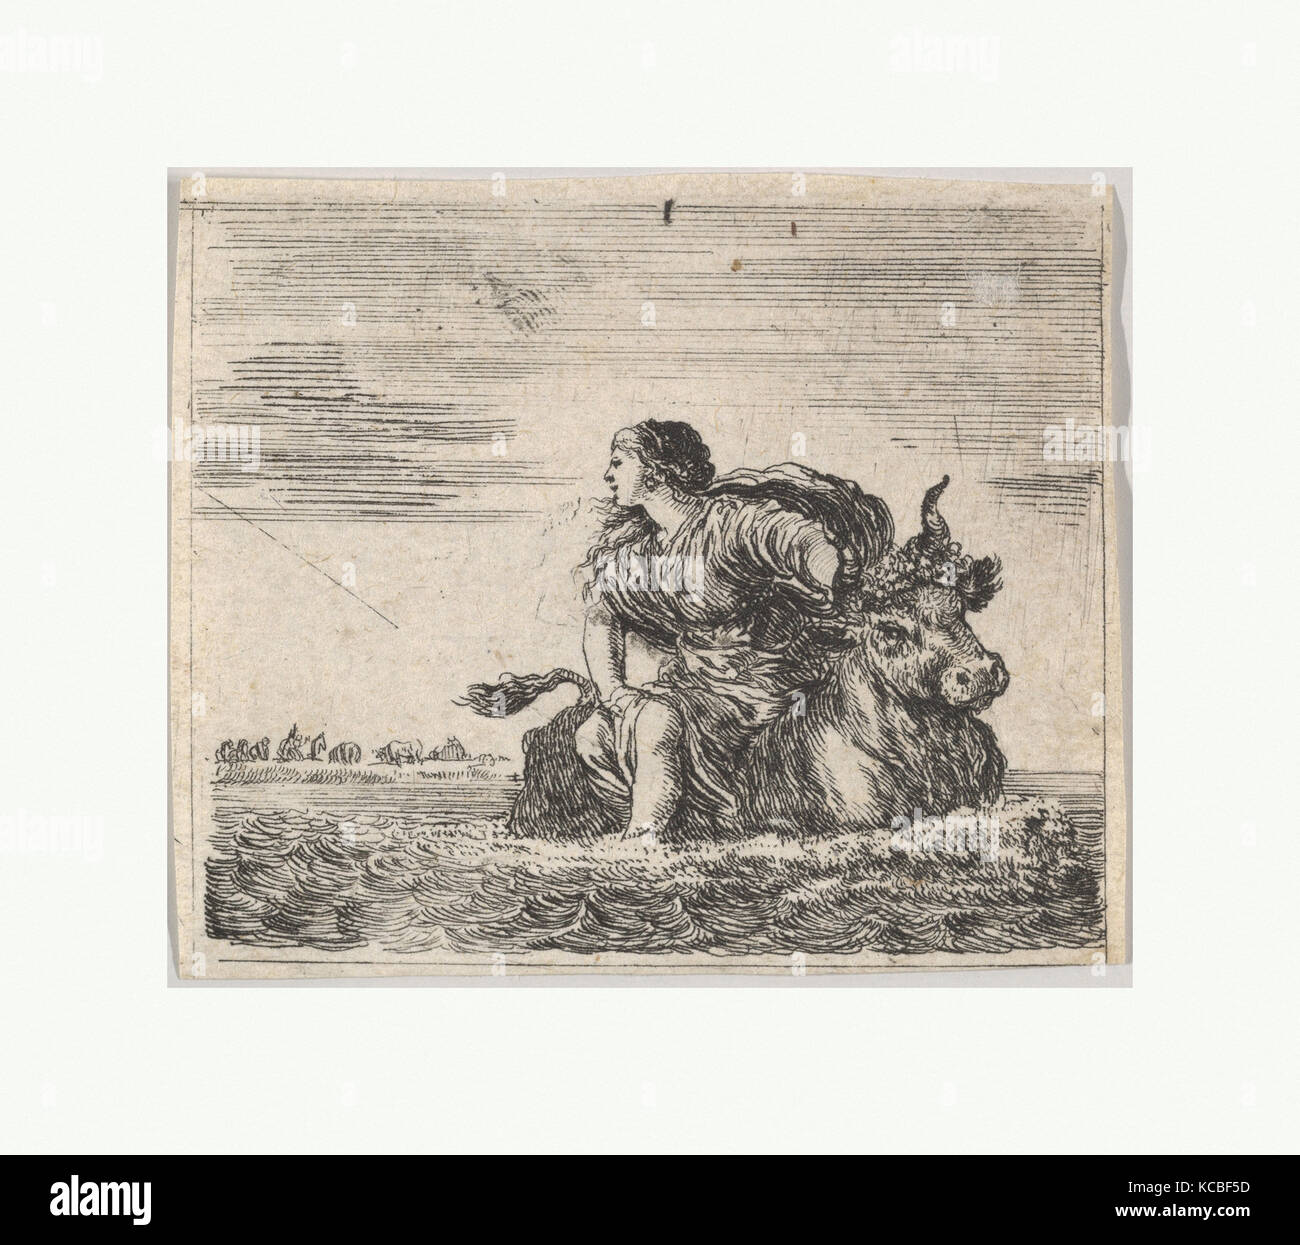 Jupiter and Europa, from 'Game of Mythology' (Jeu de la Mythologie), Stefano della Bella, 1644 - Stock Image